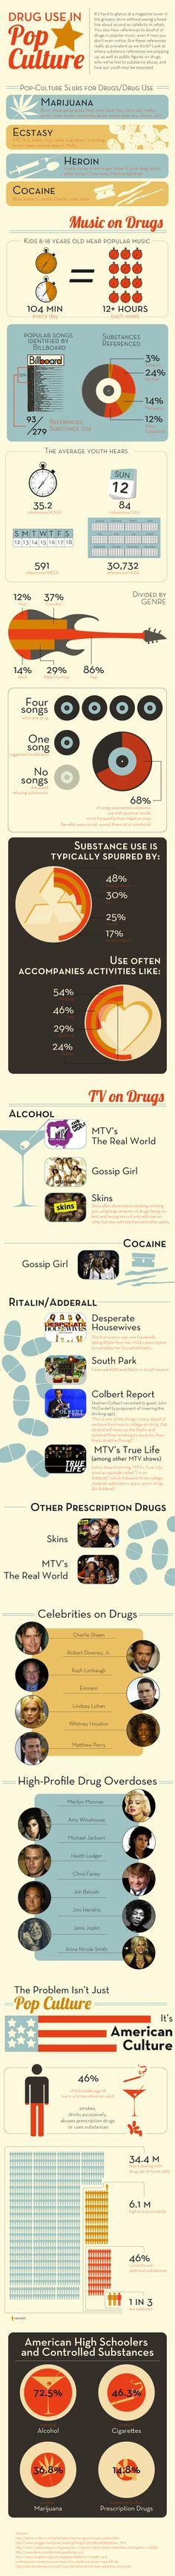 Drug Use in Pop Culture #Infographic #substanceabuse